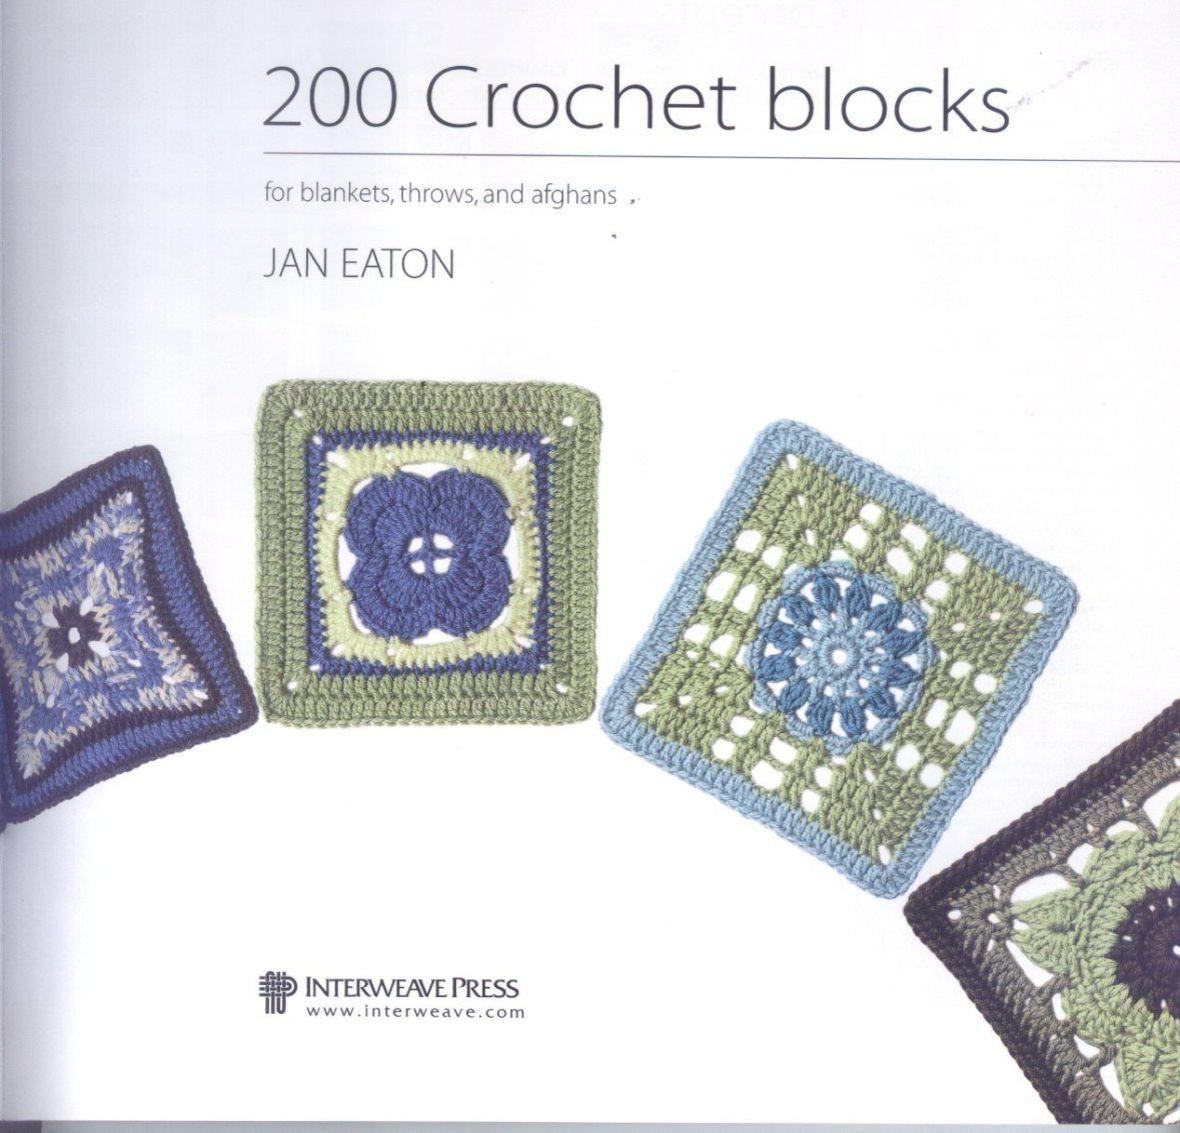 200 Crocheted Blocks for blankets, throws & Afghans 003